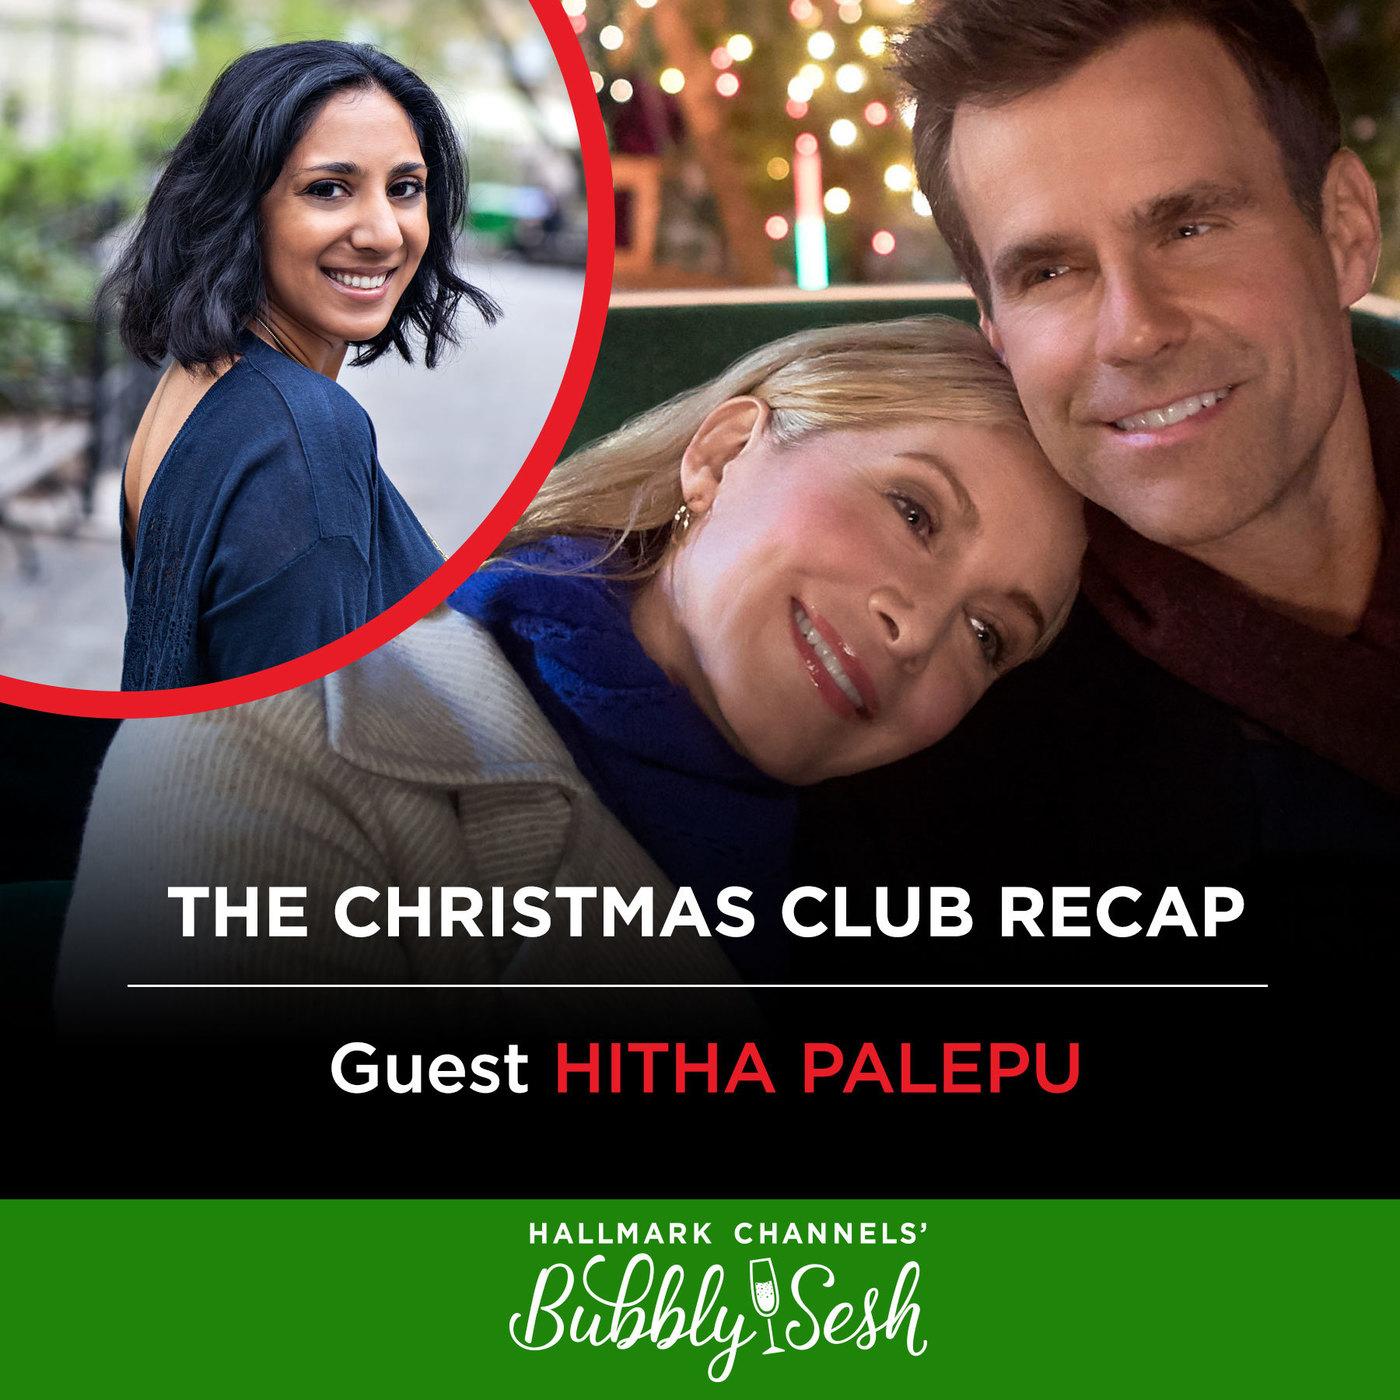 The Christmas Club Recap with Hitha Palepu